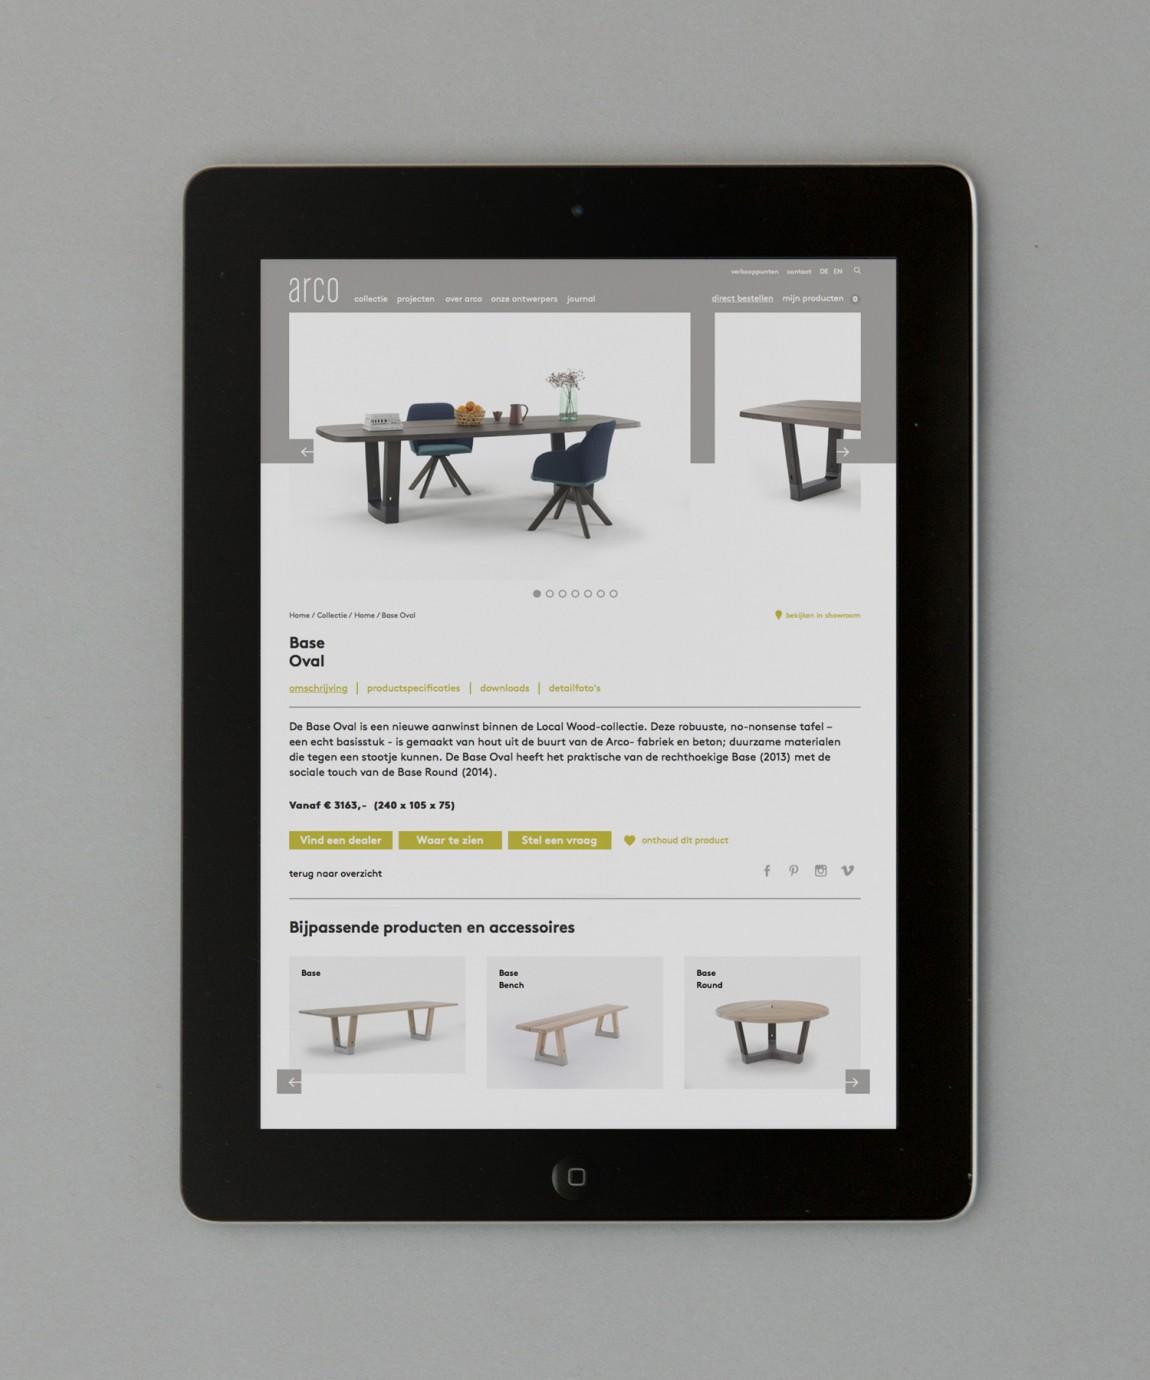 Arco家具设计制造公司VI企业形象设计,全适应网站设计